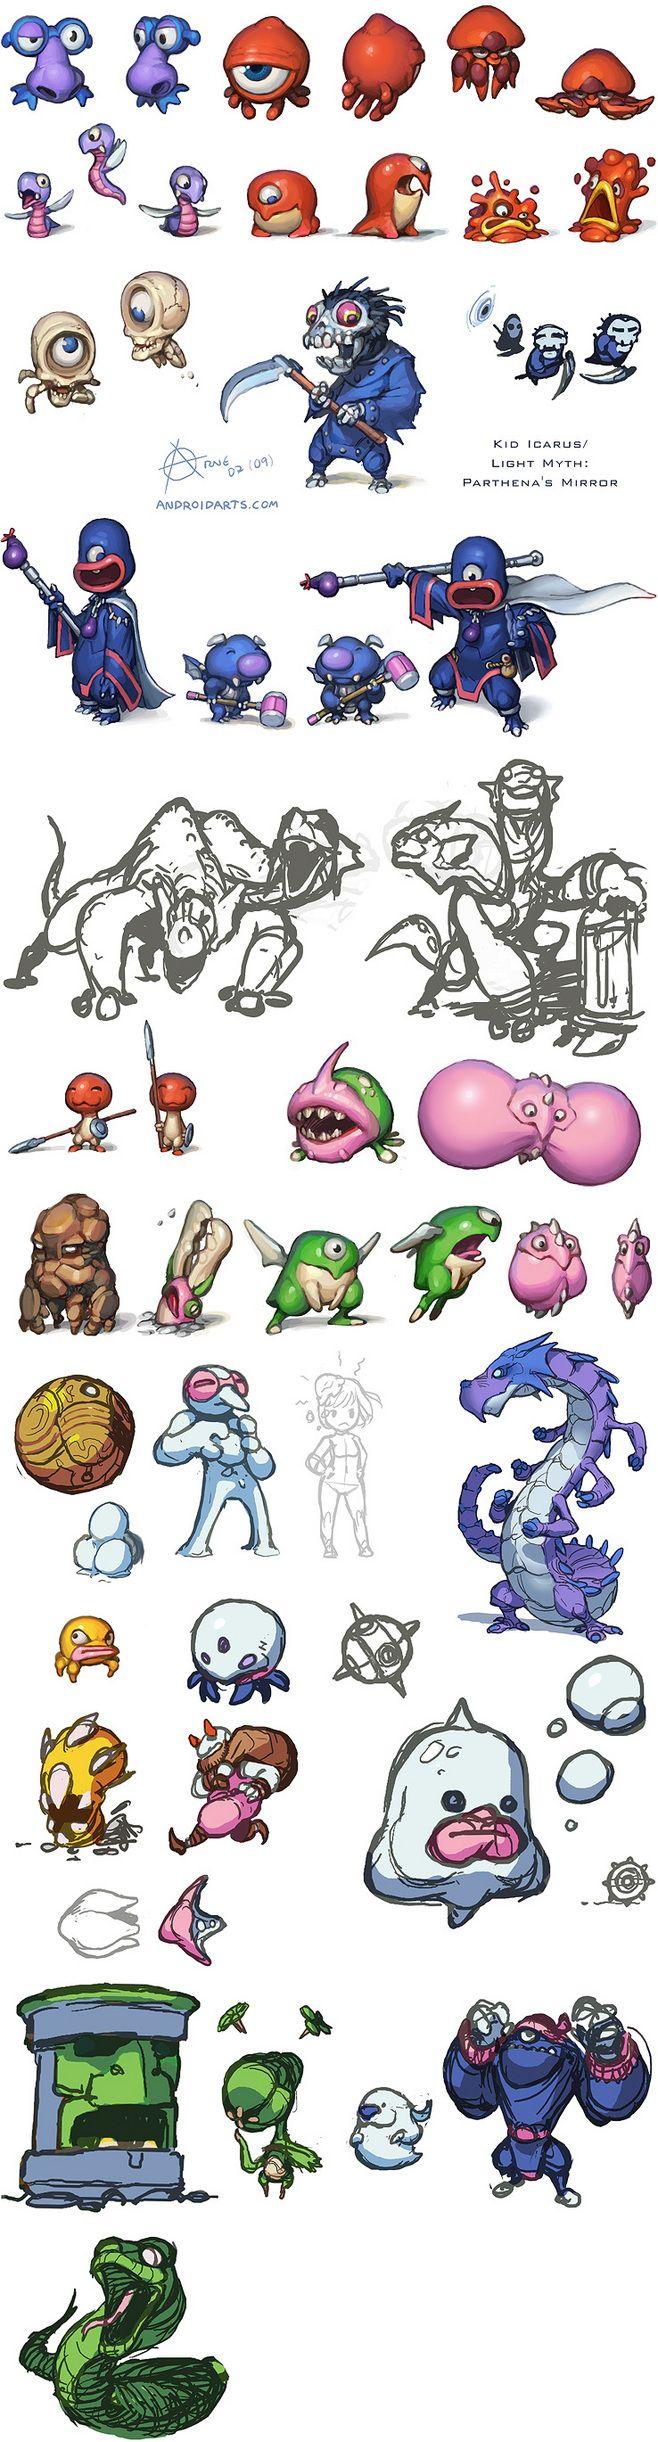 kid_icarus_monsters2...@keith_lie采集到怪兽(826图)_花瓣插画/漫画